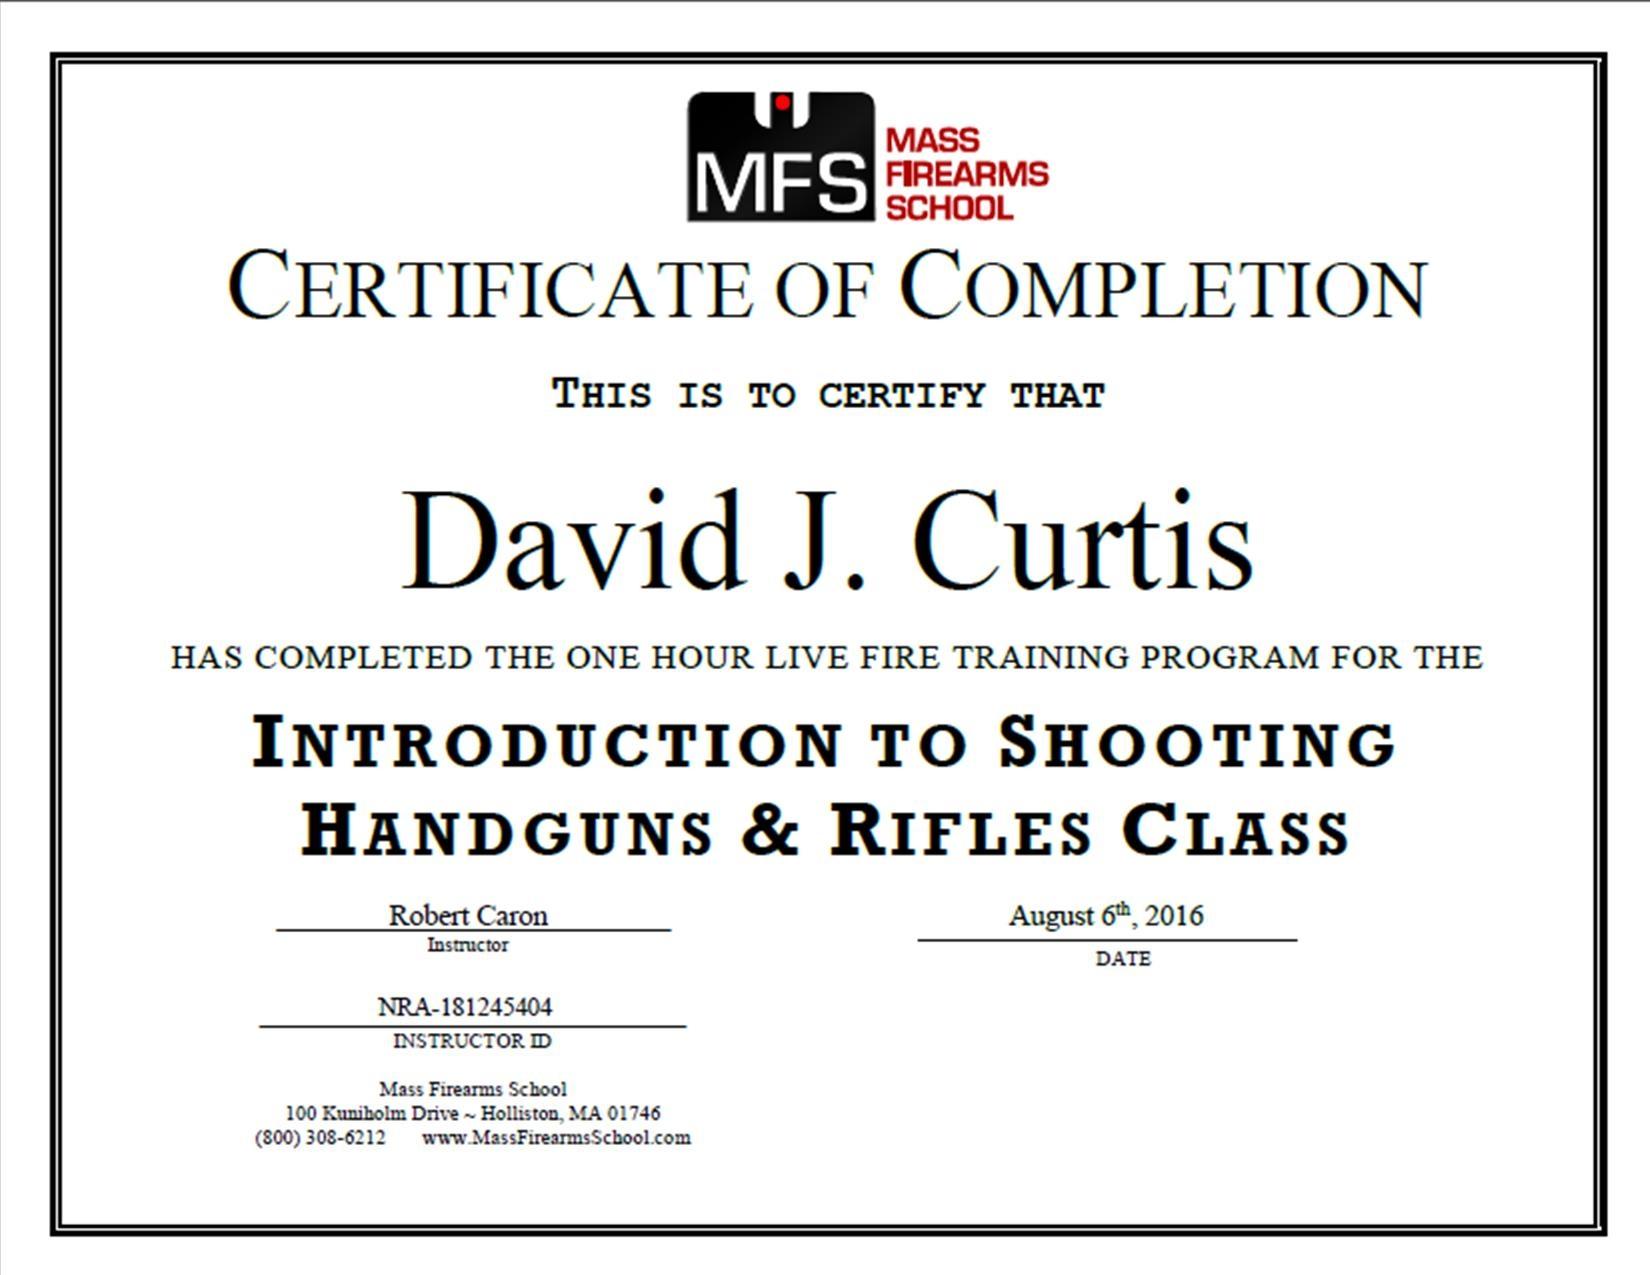 Handgus and Rifle Certified!